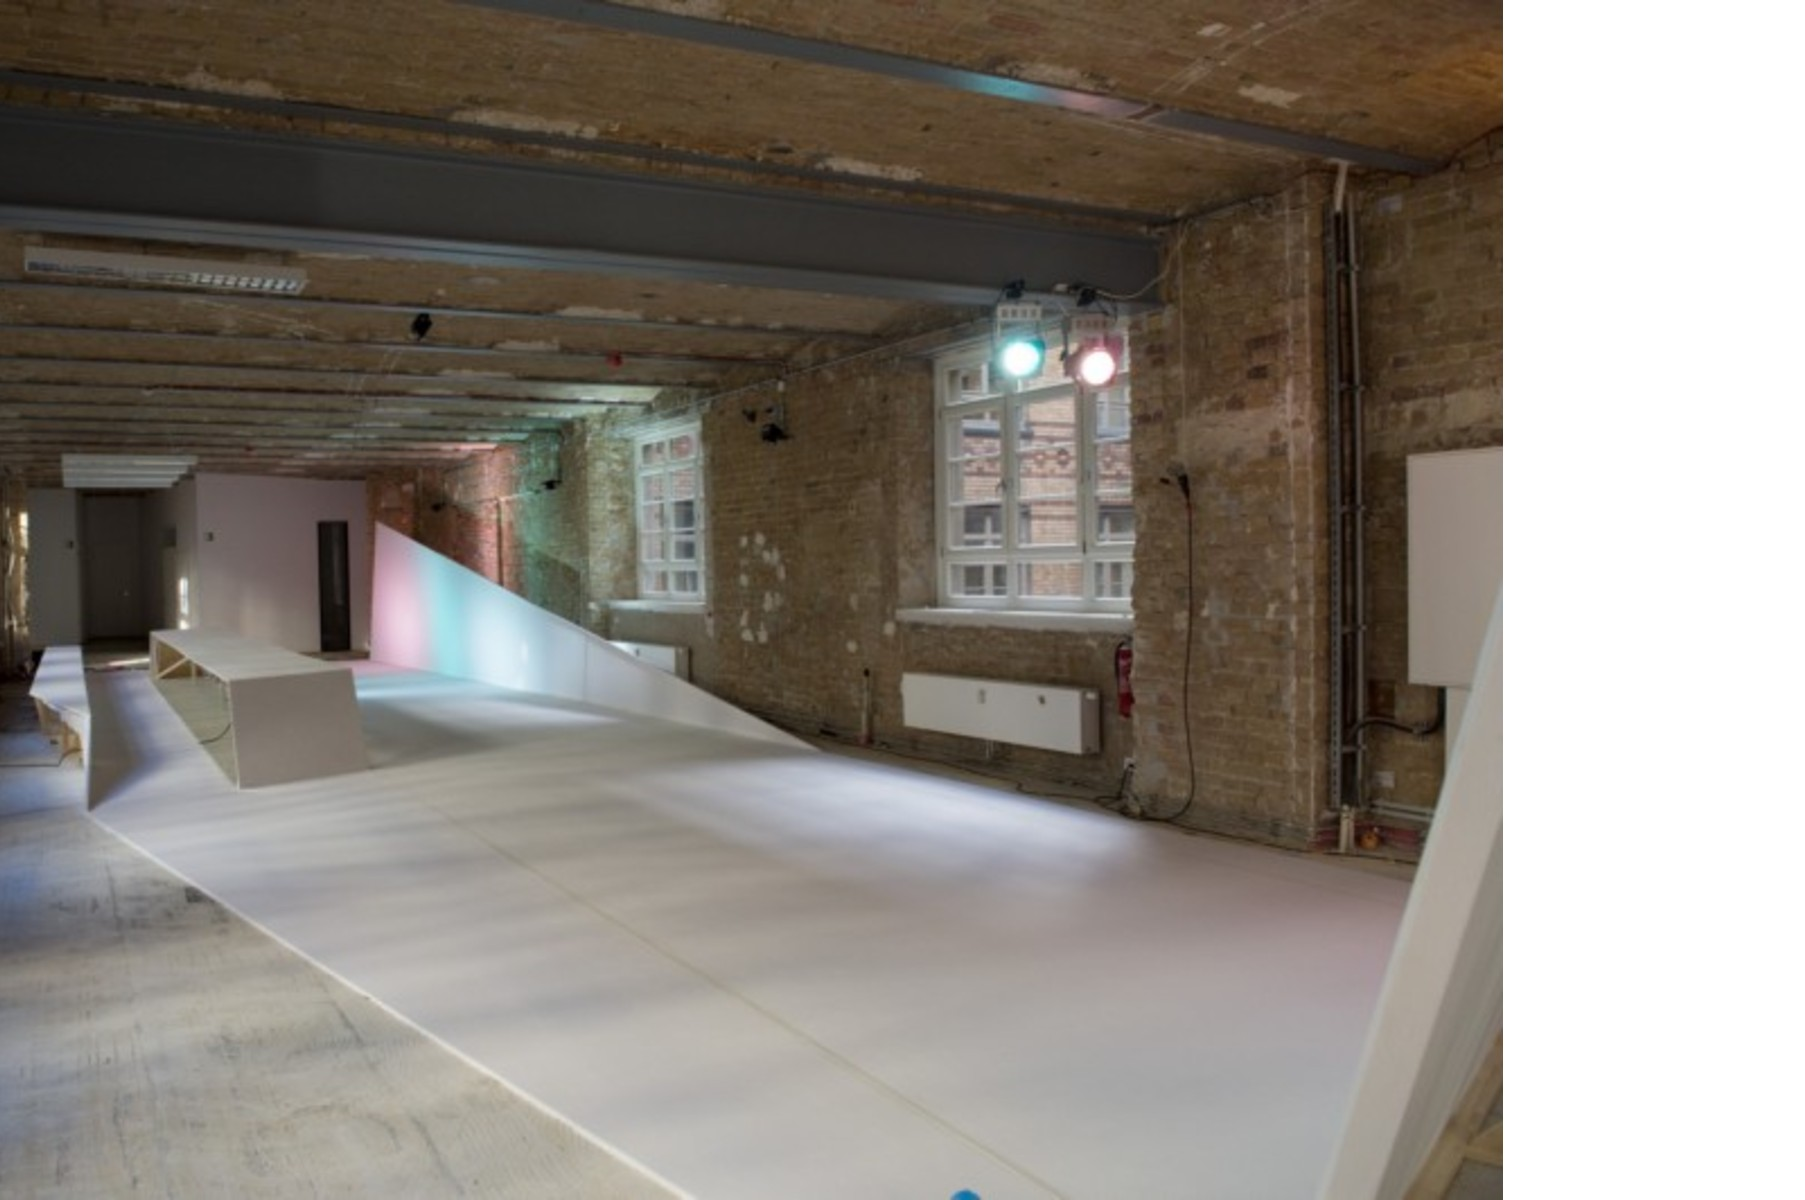 Fab architectural bureau berlin transformation of a space